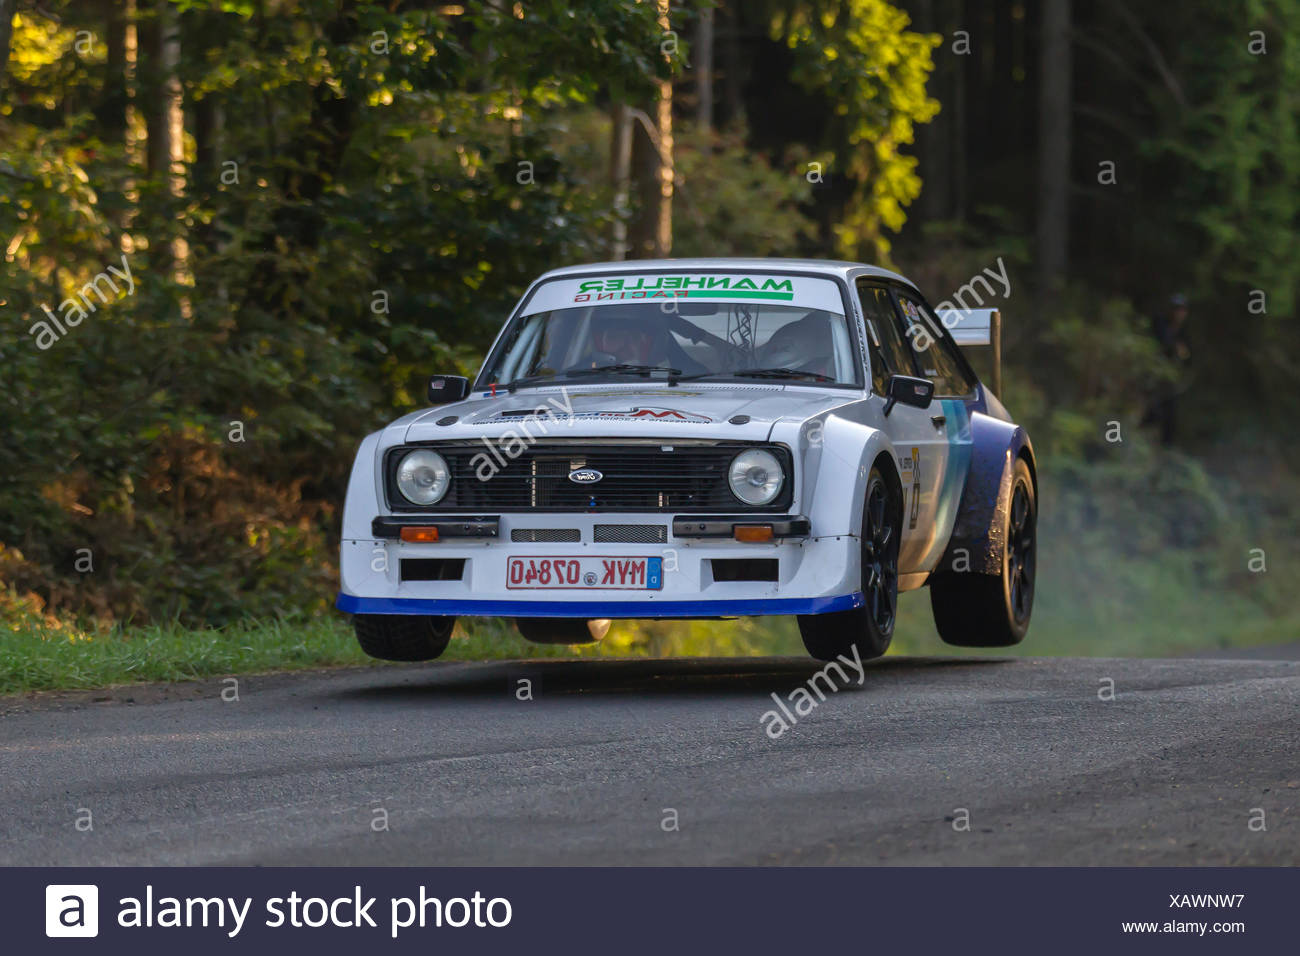 Oldtimer Eifel Rallye Festival 2014 WP 2, Daun, Vulkaneifel, Eifel, Rhineland-Palatinate, Germany - Stock Image